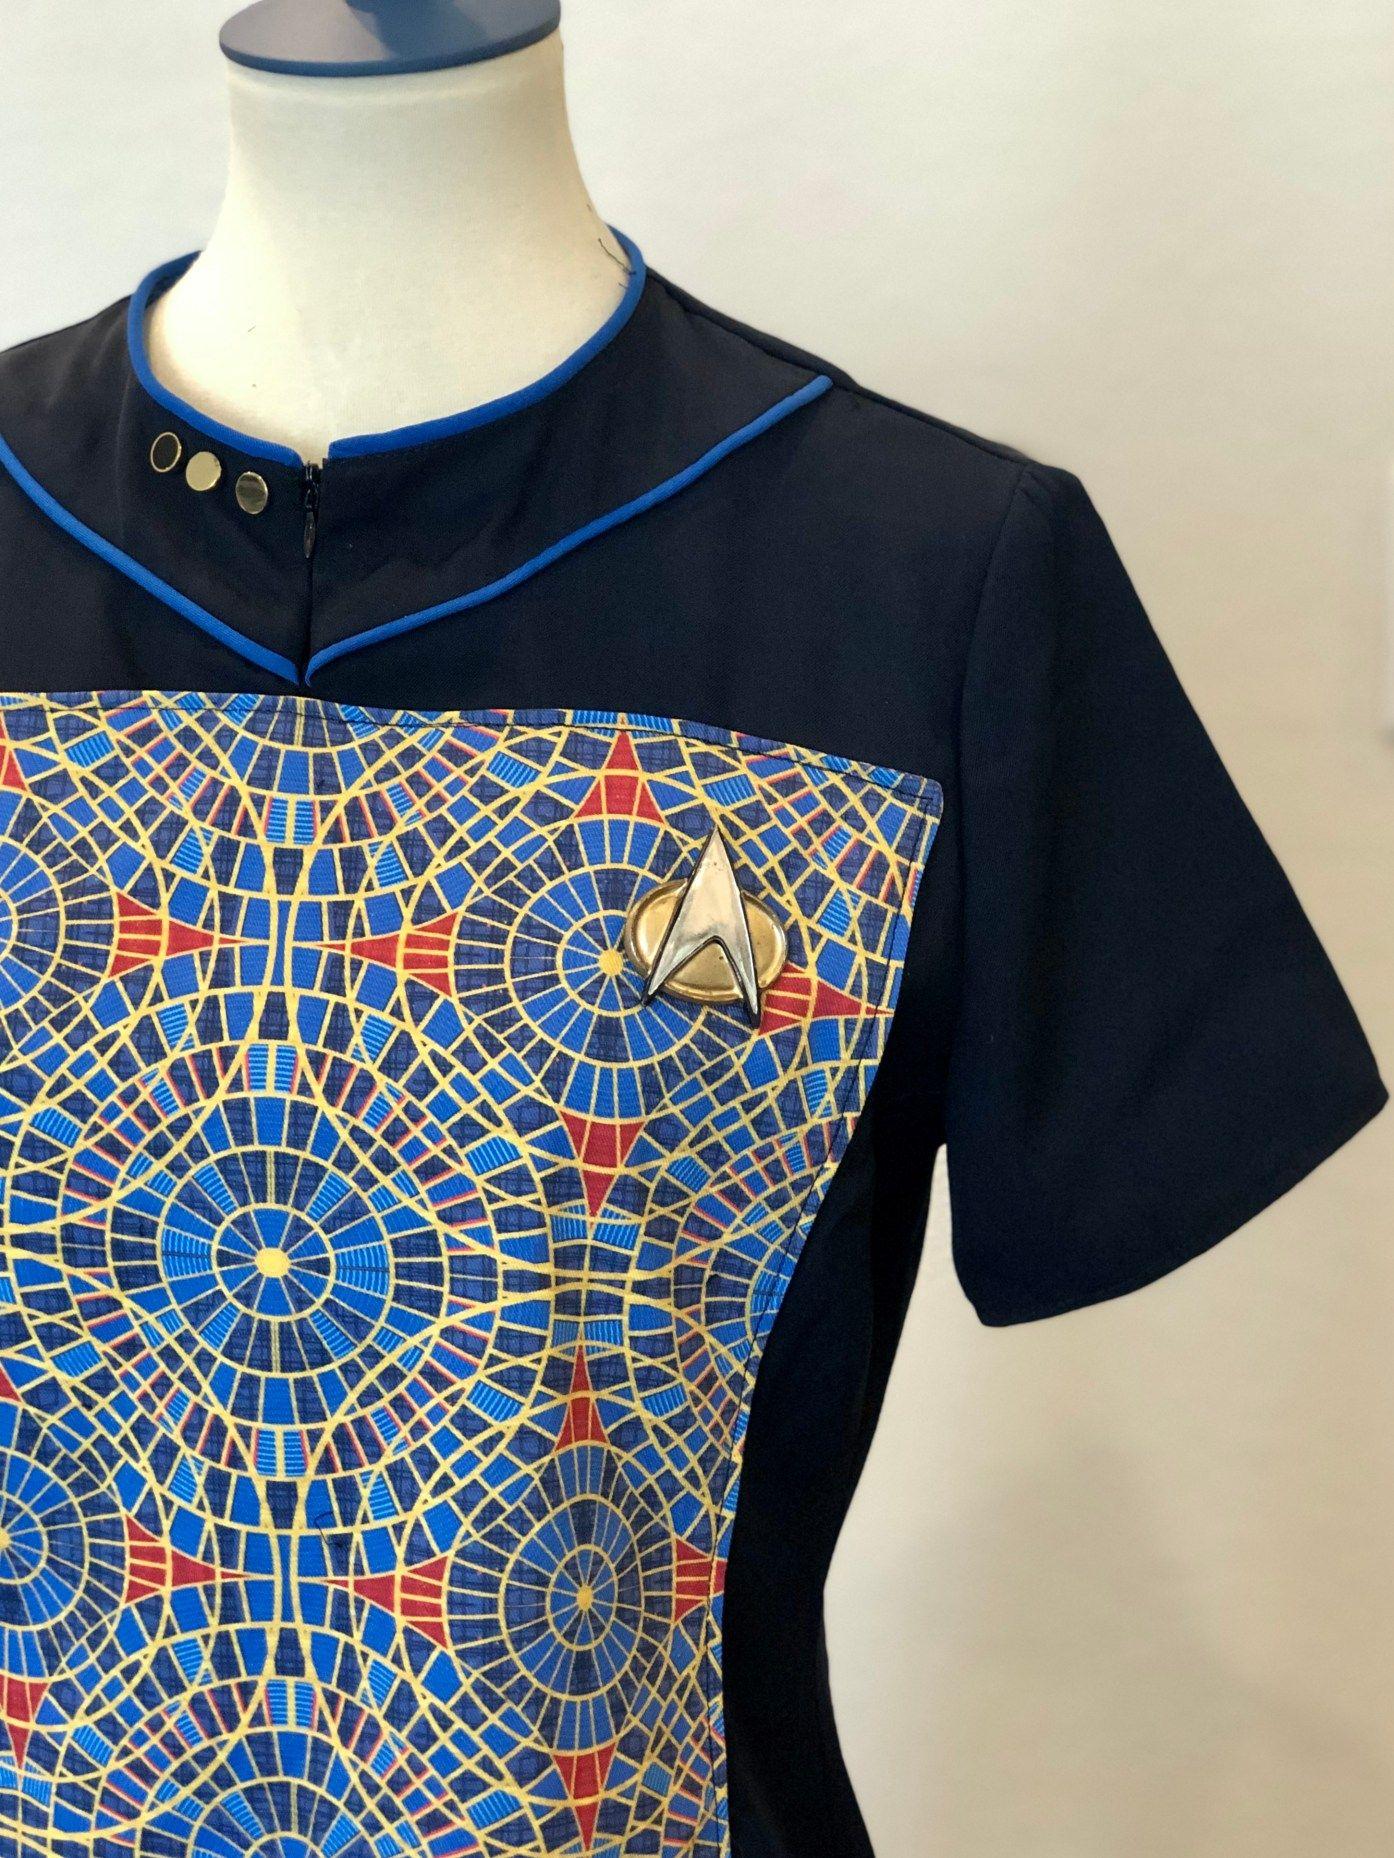 Deanna Troi From Star Trek Tng But Make It Dragoncon Marriott Carpet In 2020 Deanna Troi Dragoncon Costumes